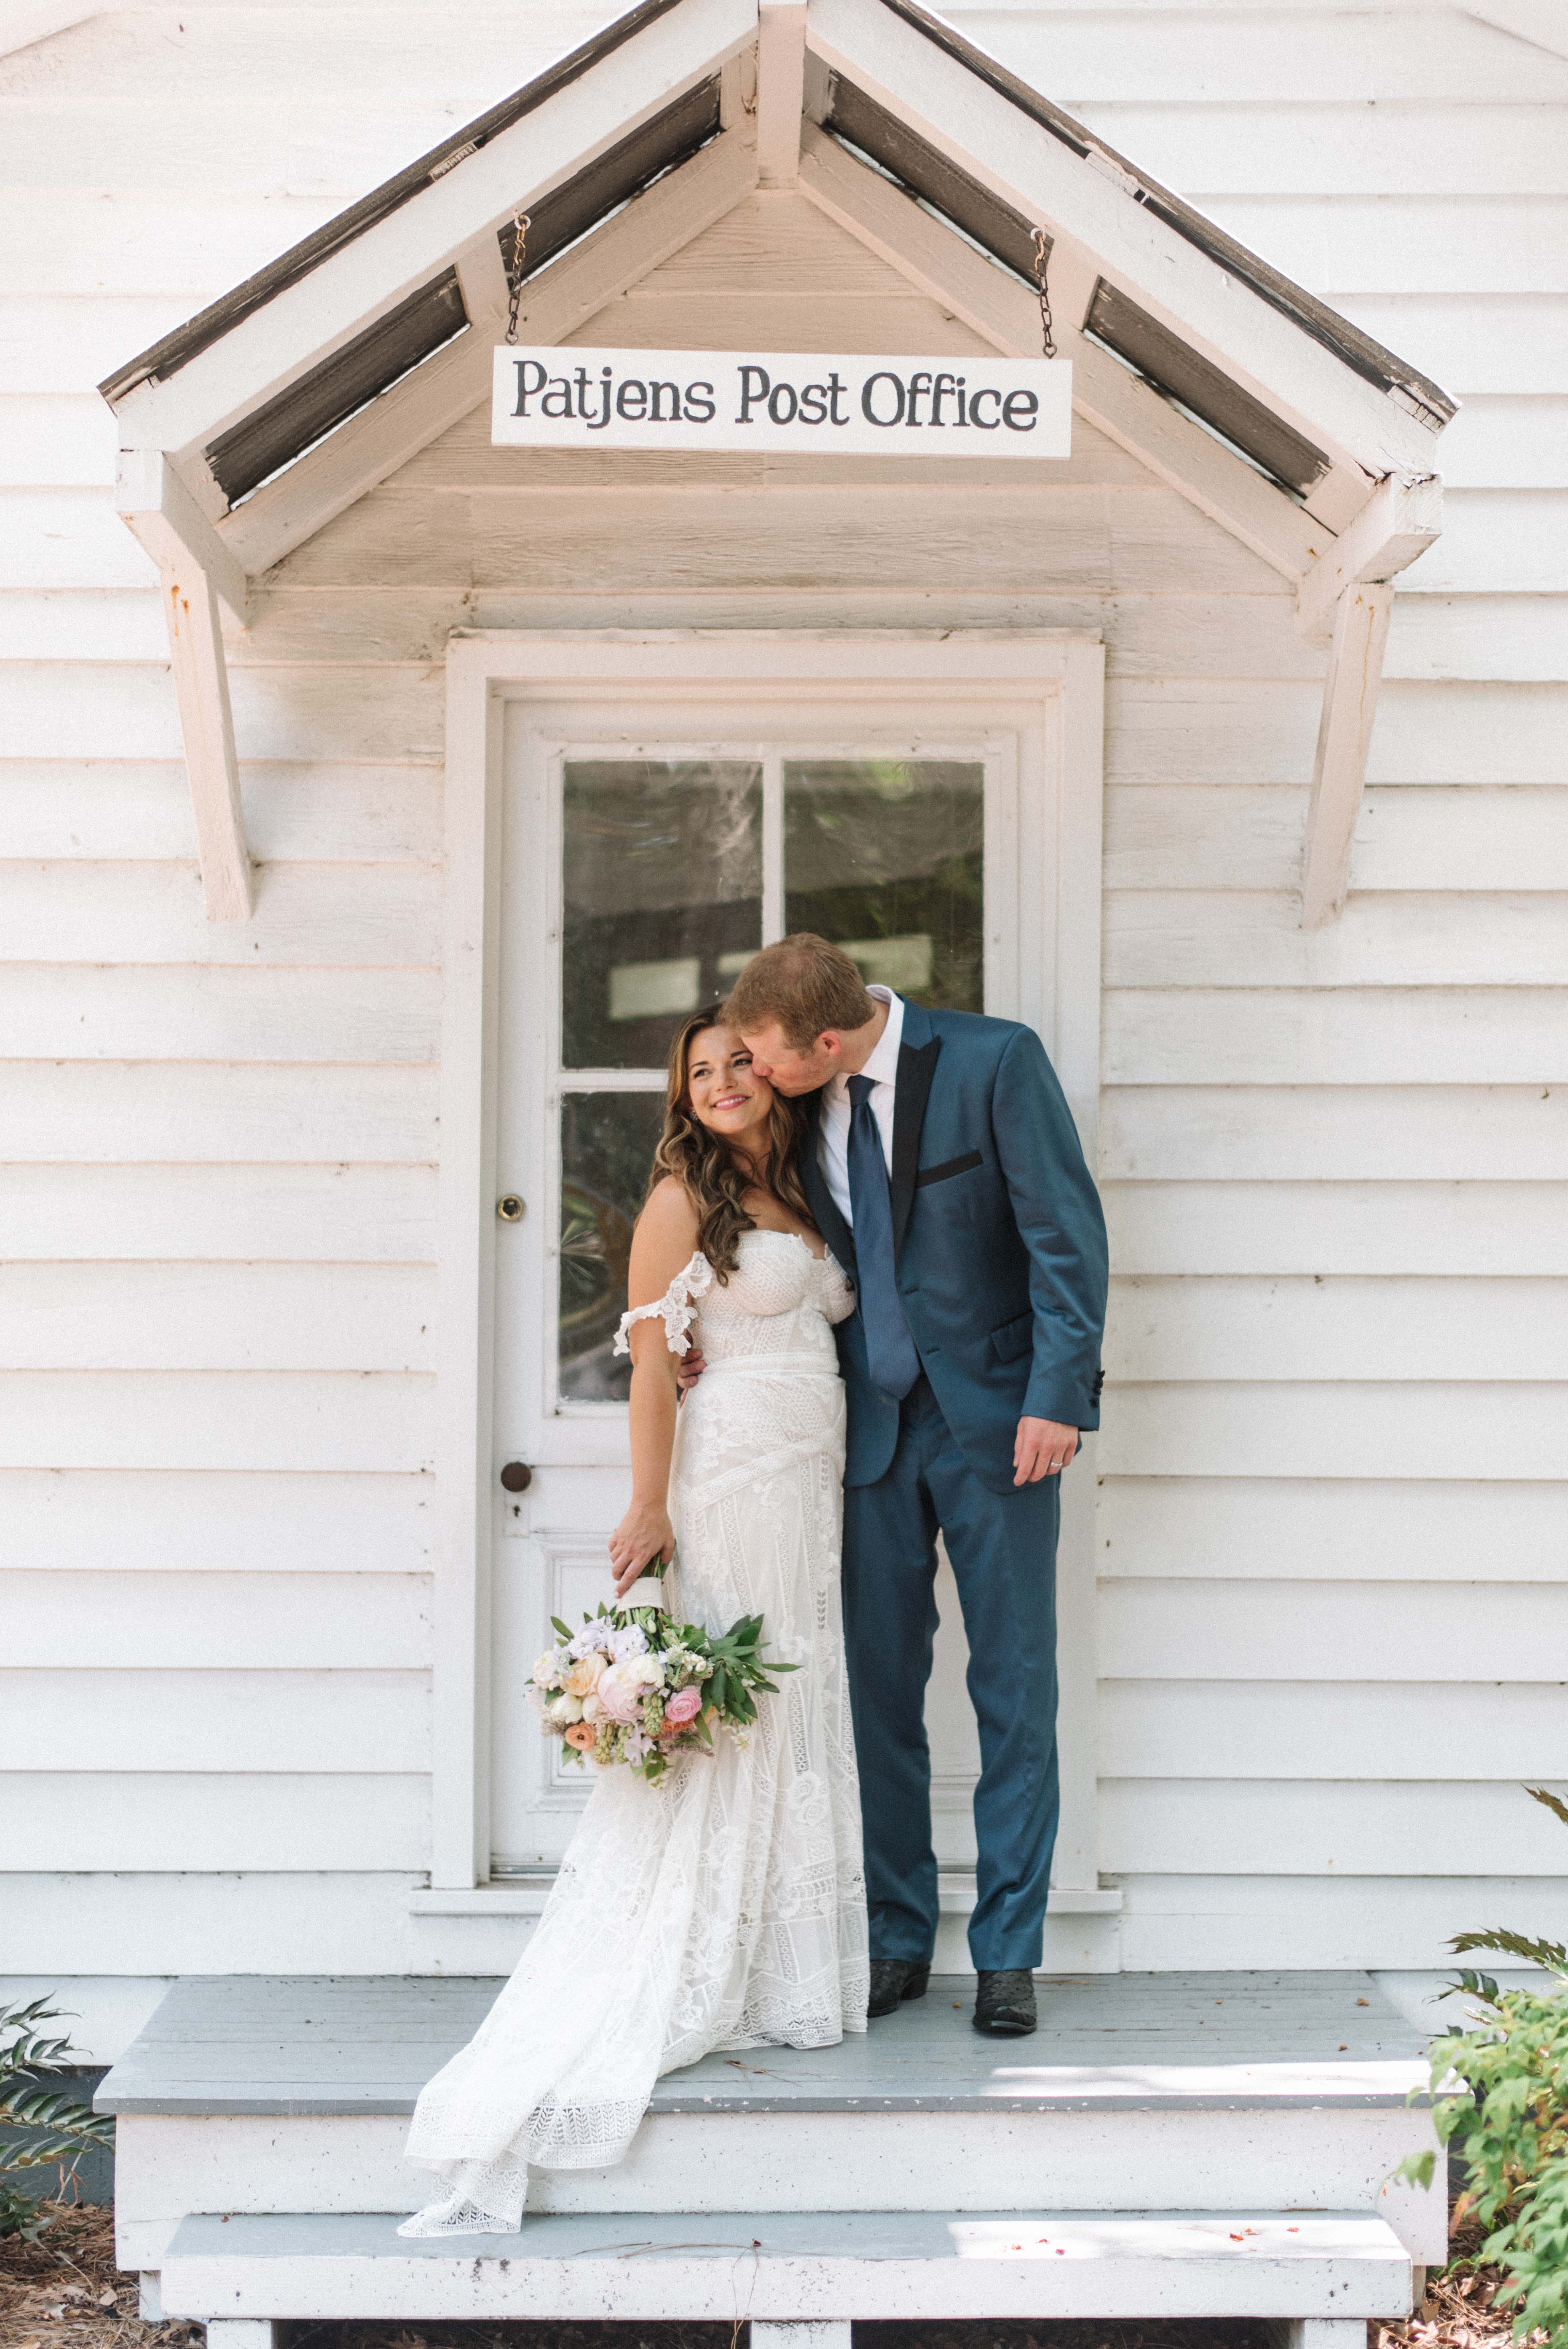 Wedding Planning Tips   A Timeline of Smart & Savvy Wedding Tips   Rhyme & Reason